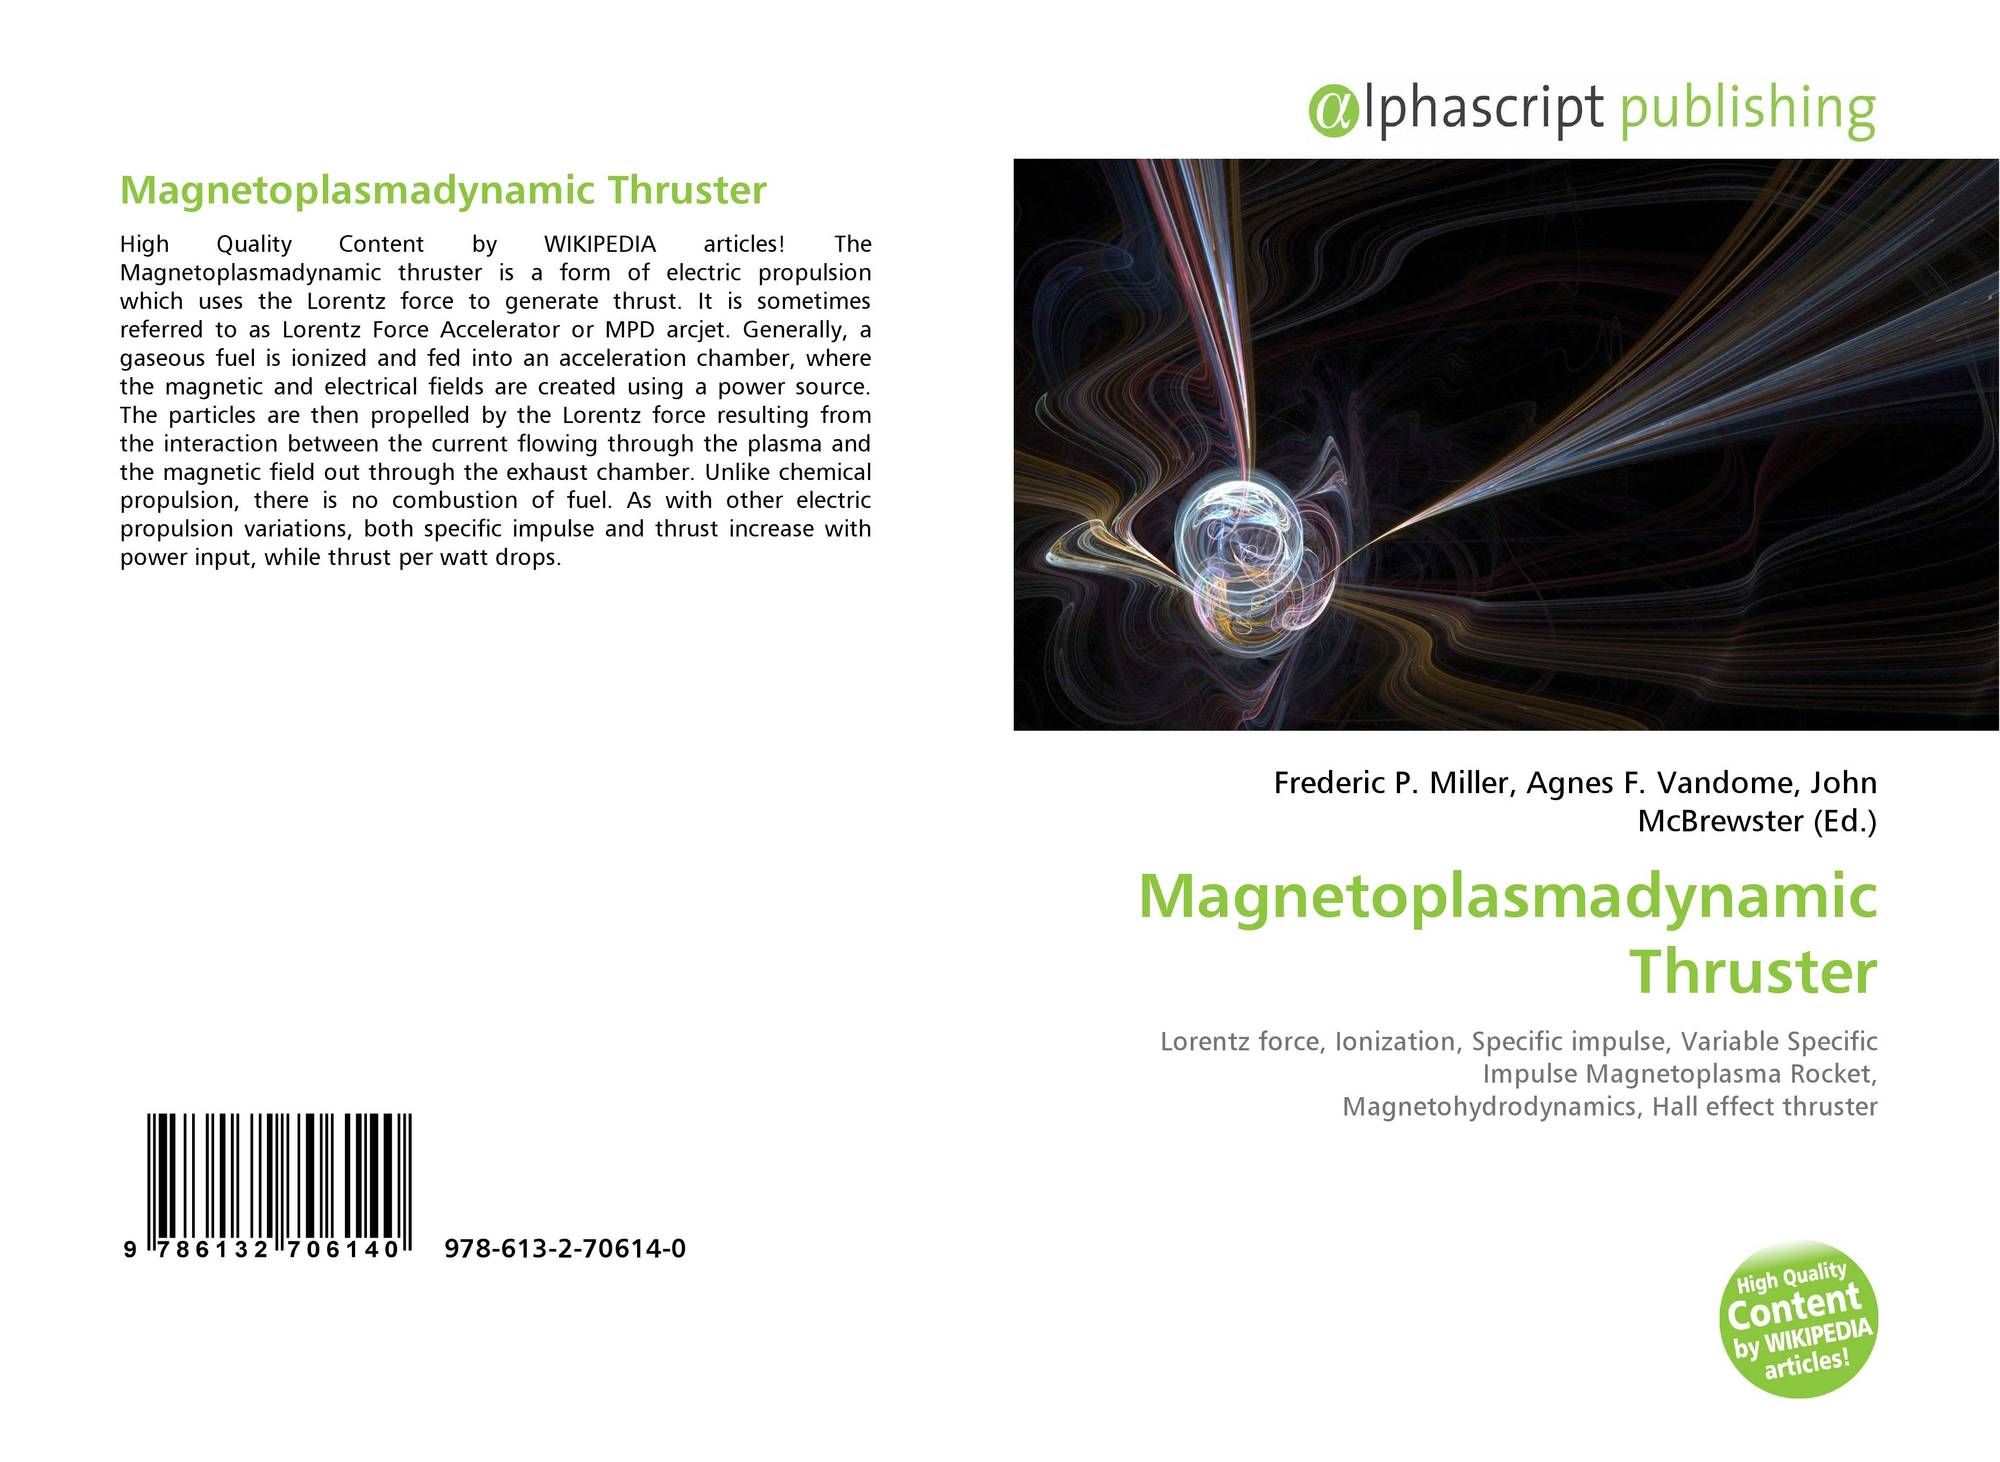 Magnetoplasmadynamic Thruster, 978-613-2-70614-0, 6132706143